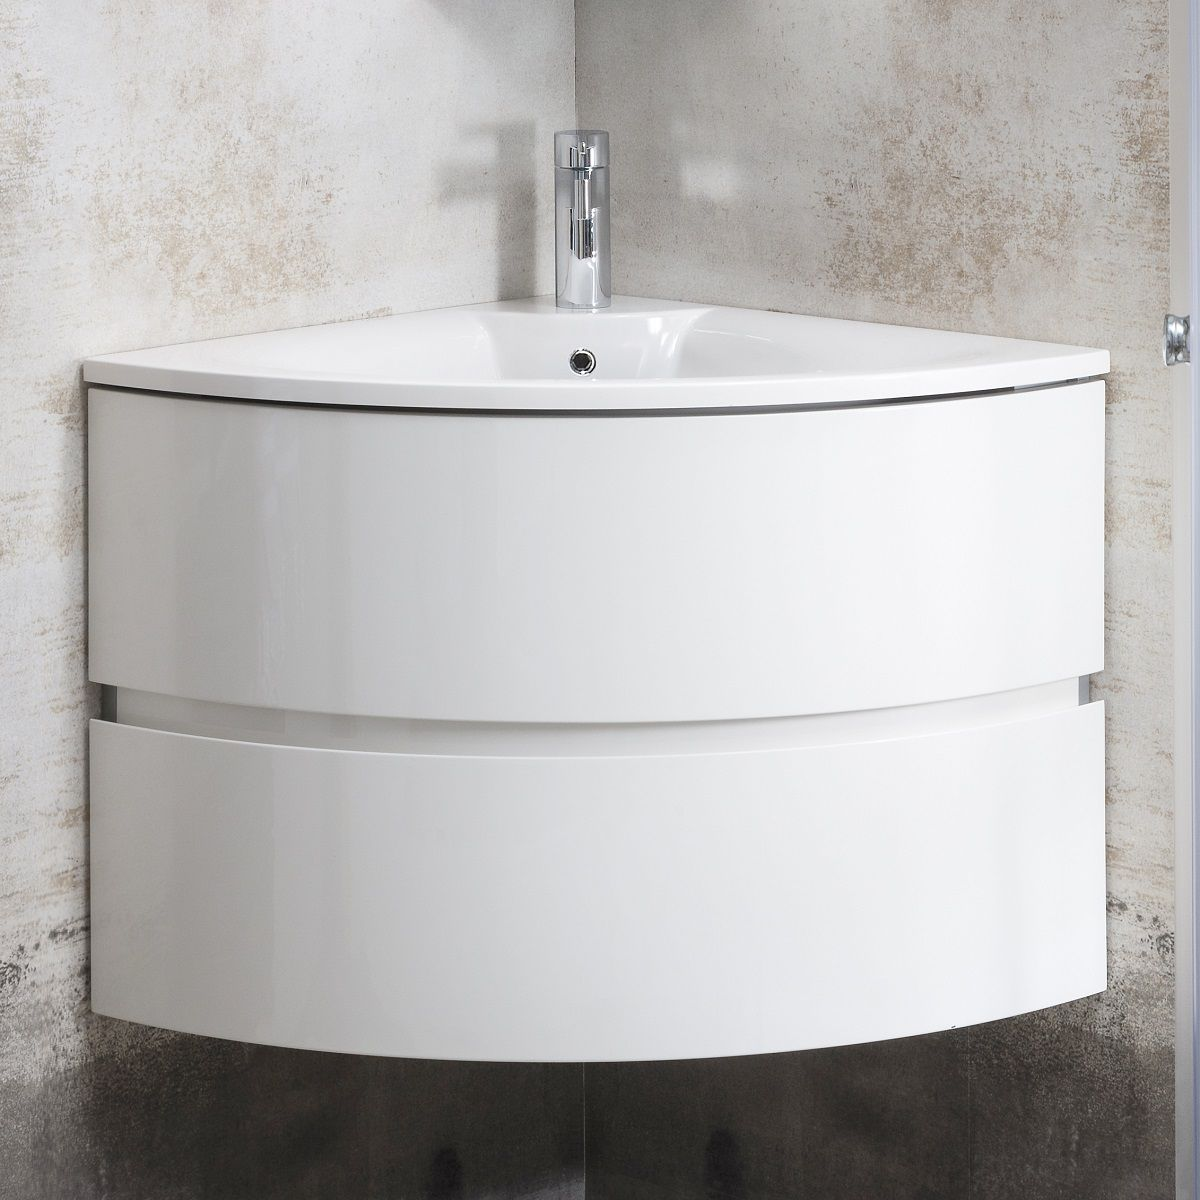 Corner Bathroom Sink Unit Uk Image Of Bathroom And Closet